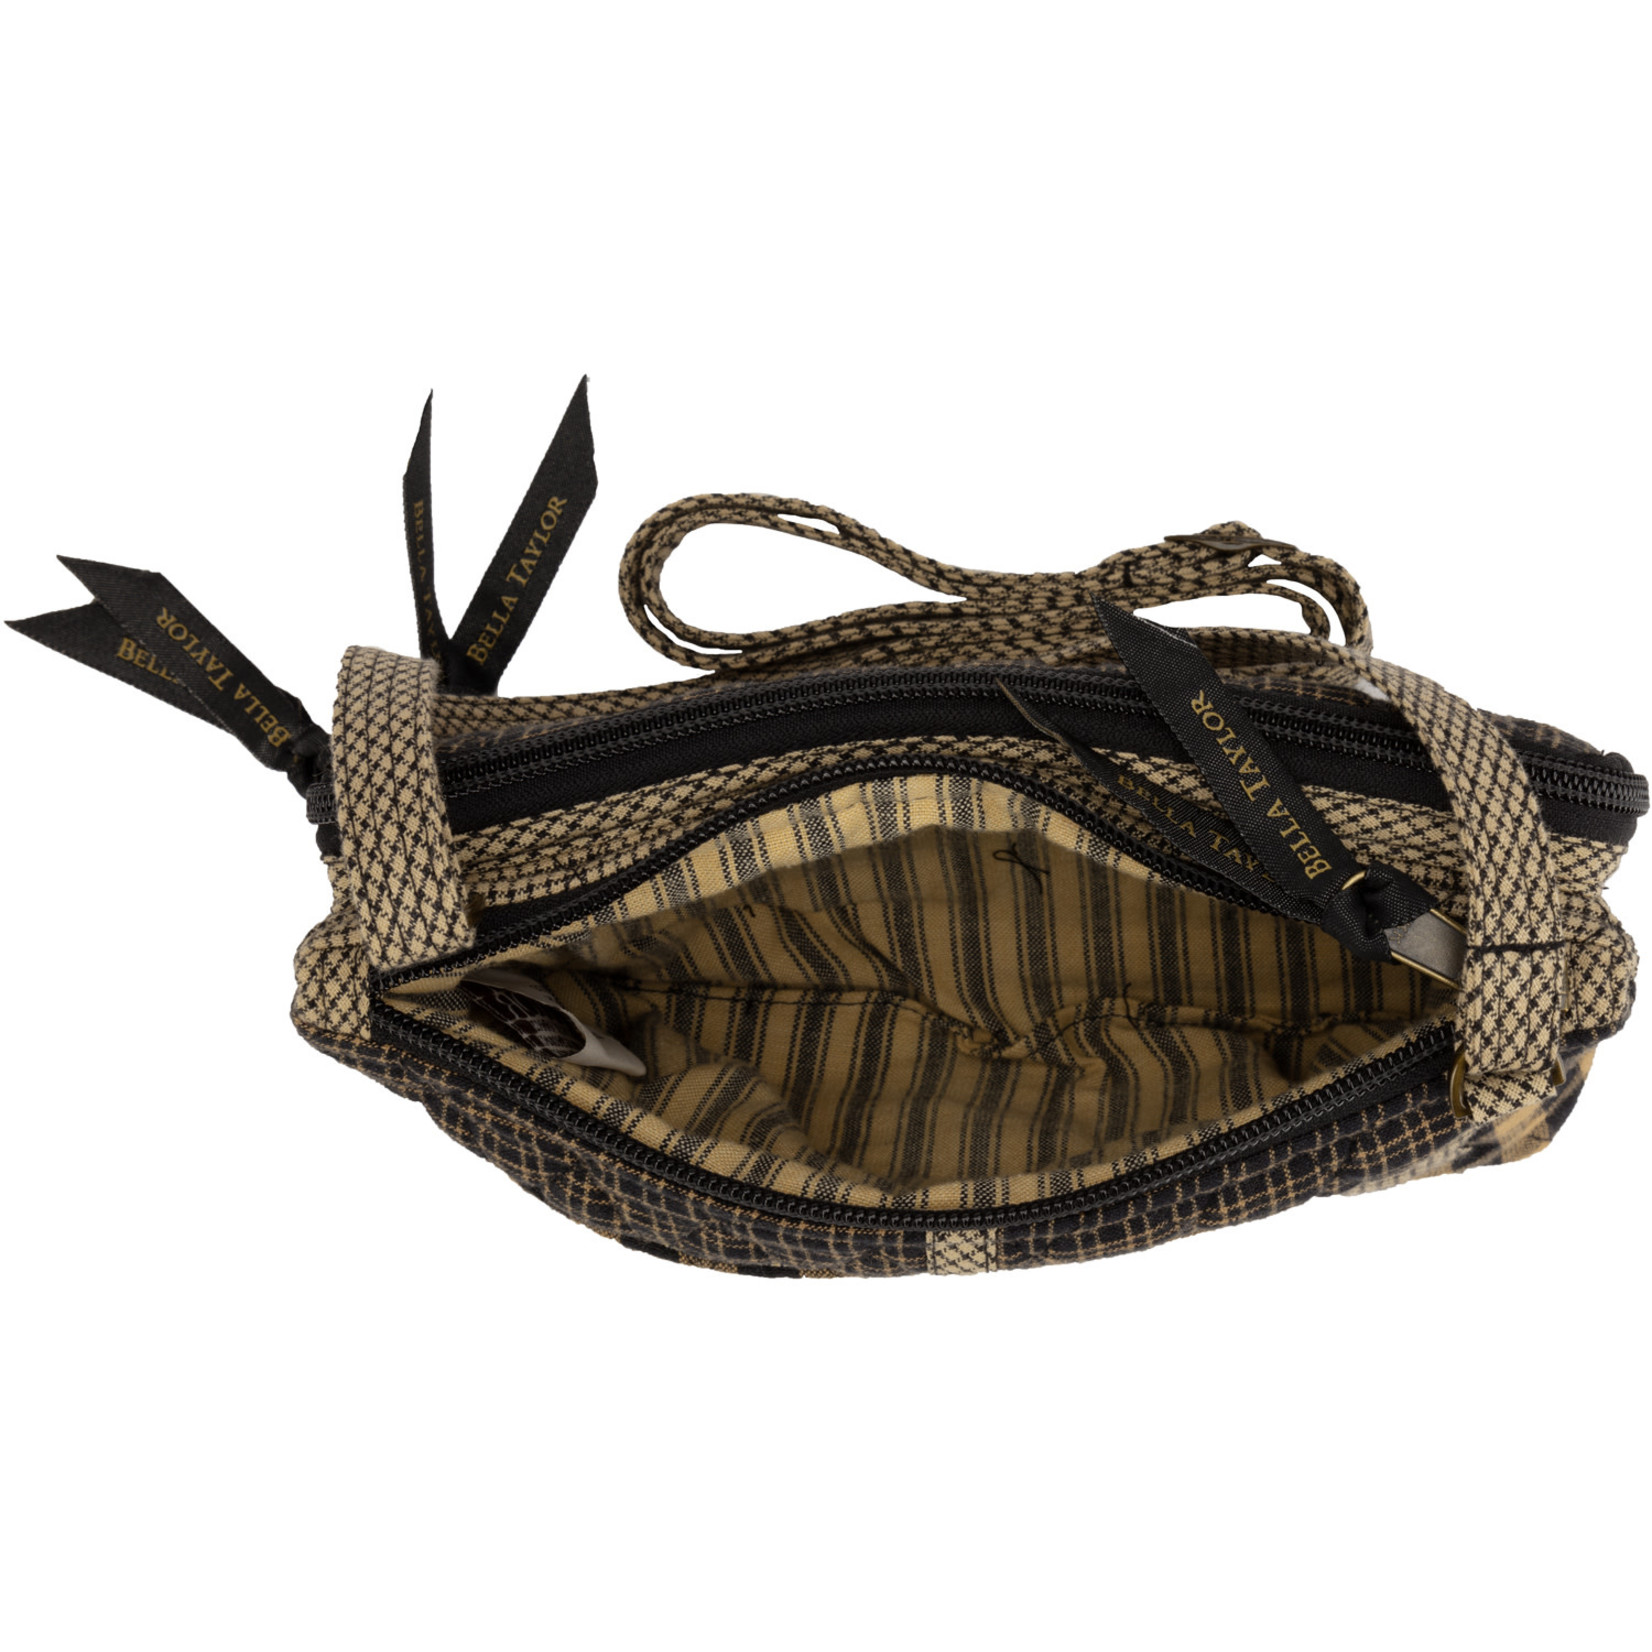 Bella Taylor Farmhouse Star - Essentials handbag